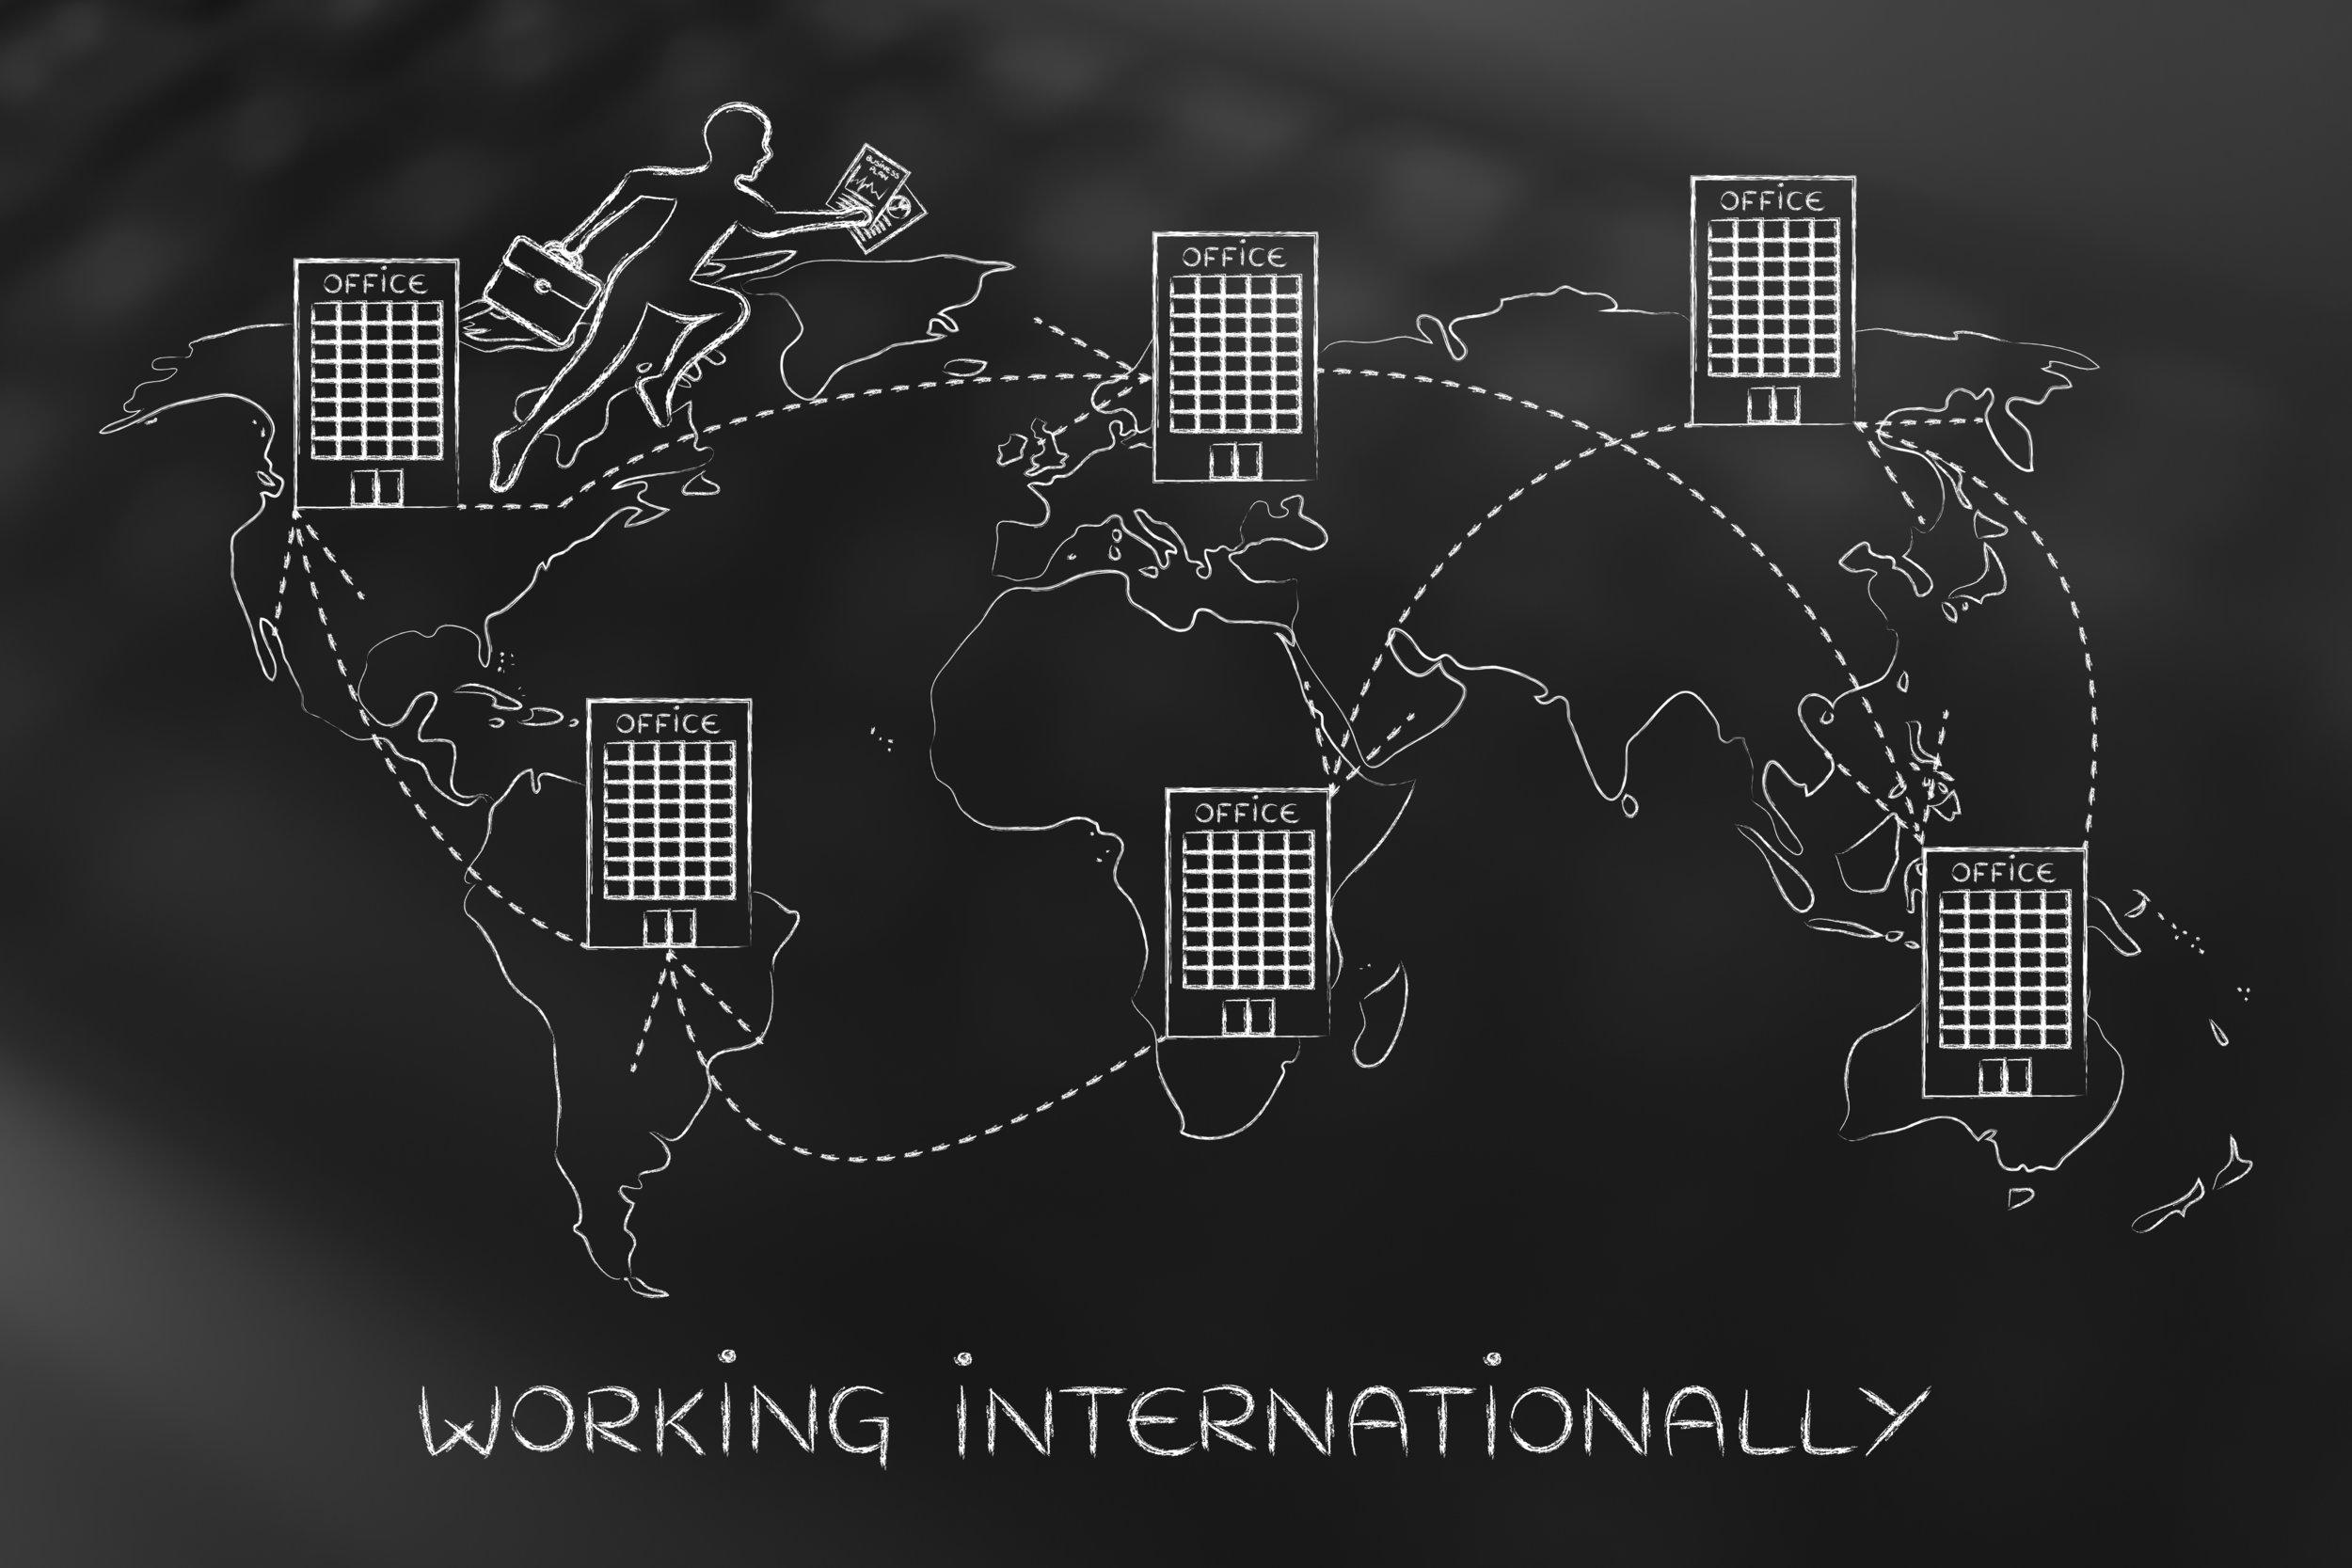 International_work_transitions_JBCC